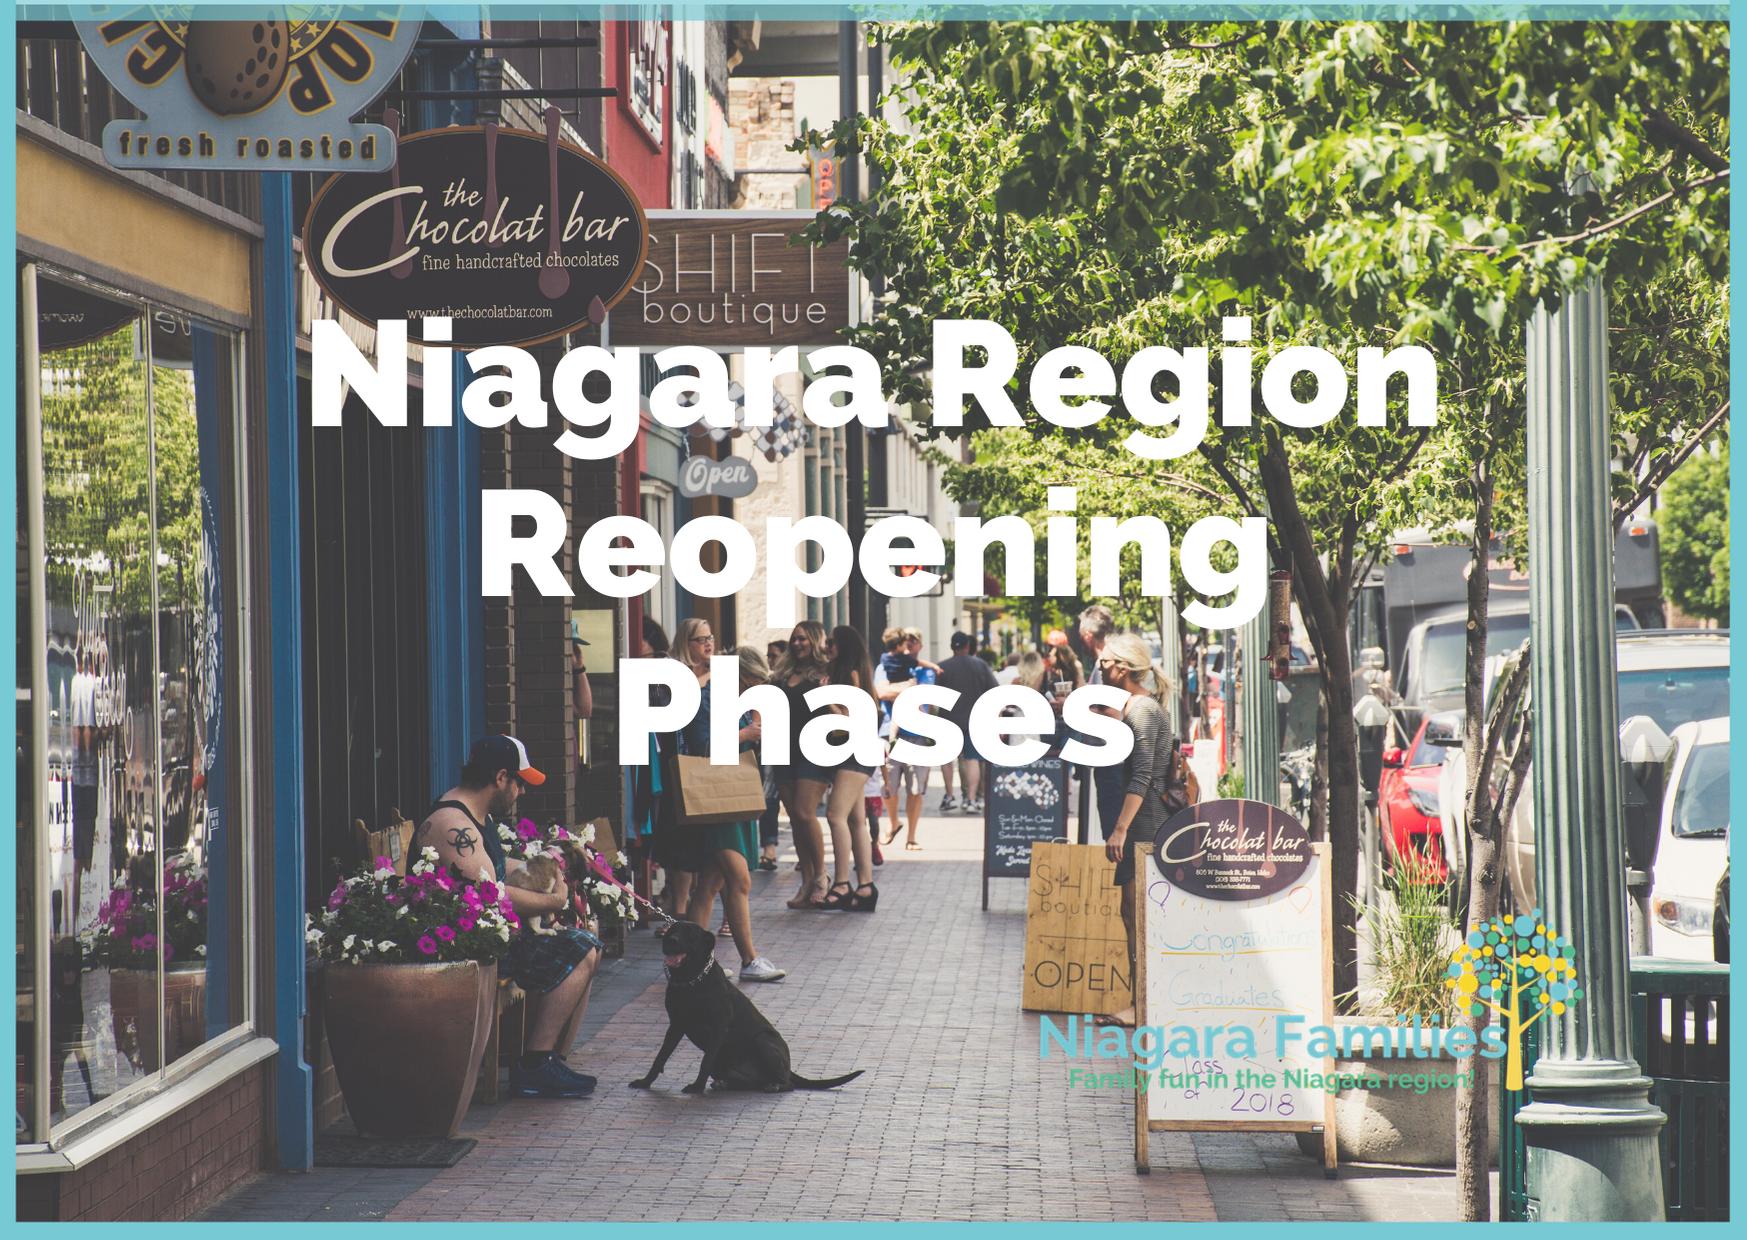 niagara region reopening phases